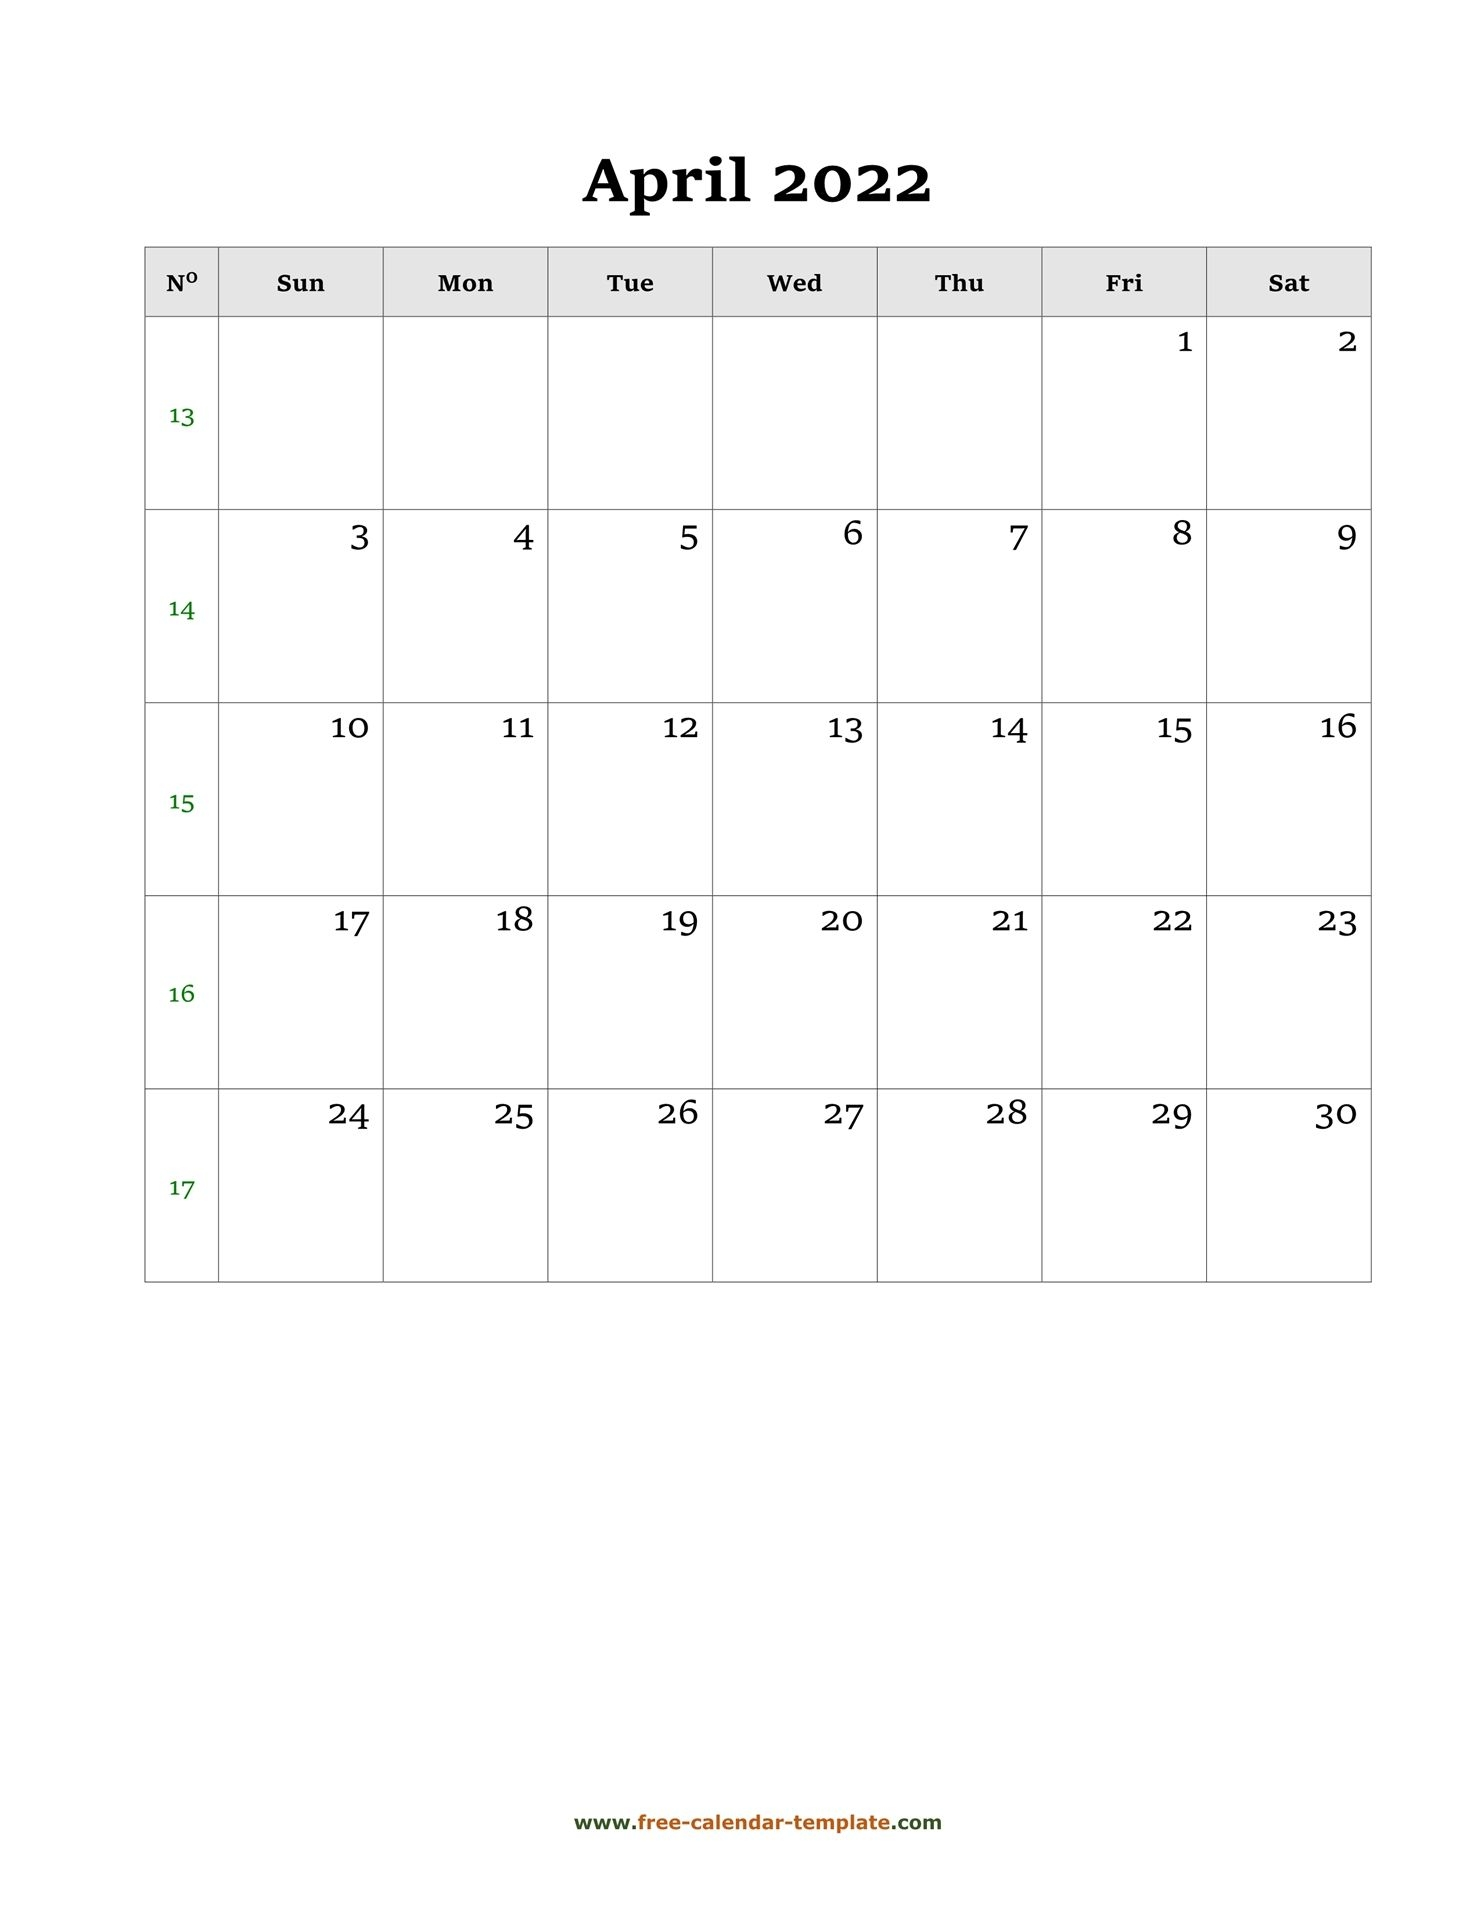 April Calendar 2022 Simple Design With Large Box On Each